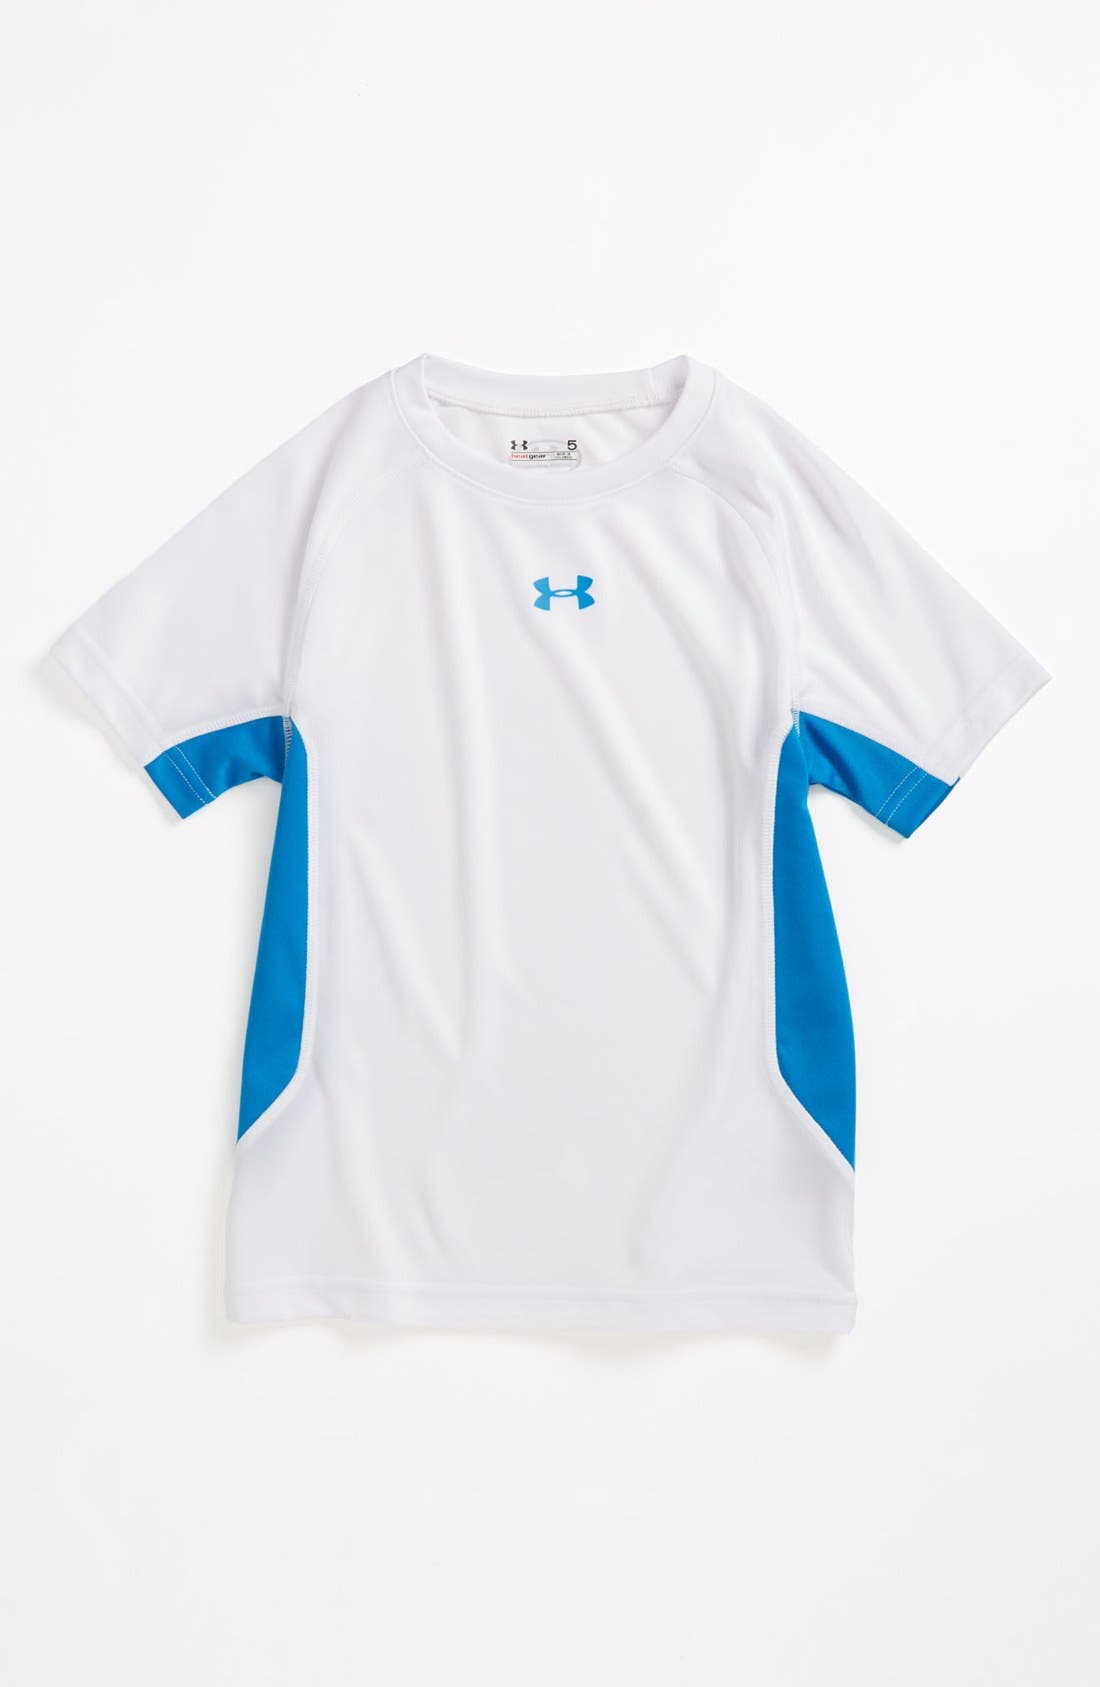 Main Image - Under Armour 'Scrimmage' HeatGear® T-Shirt (Toddler Boys)